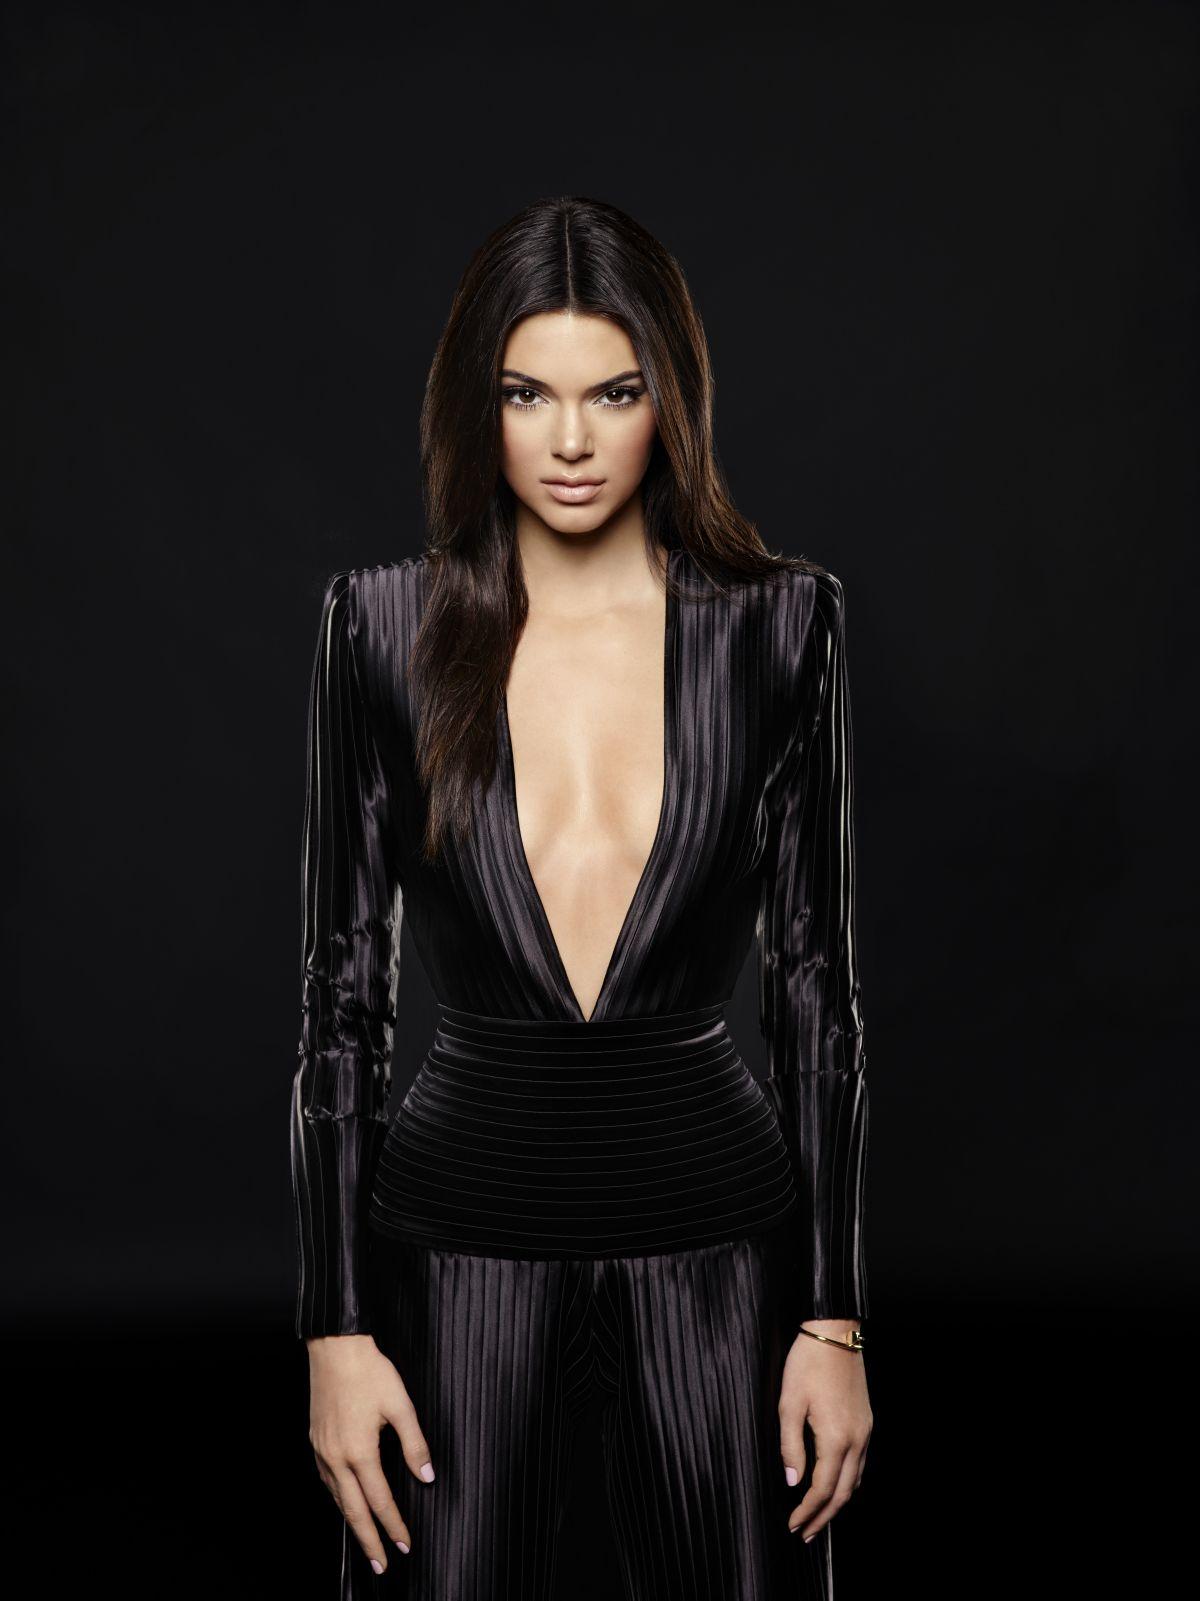 KENDALL JENNER - Keeping Up With The Kardashians, Season 11 Promo